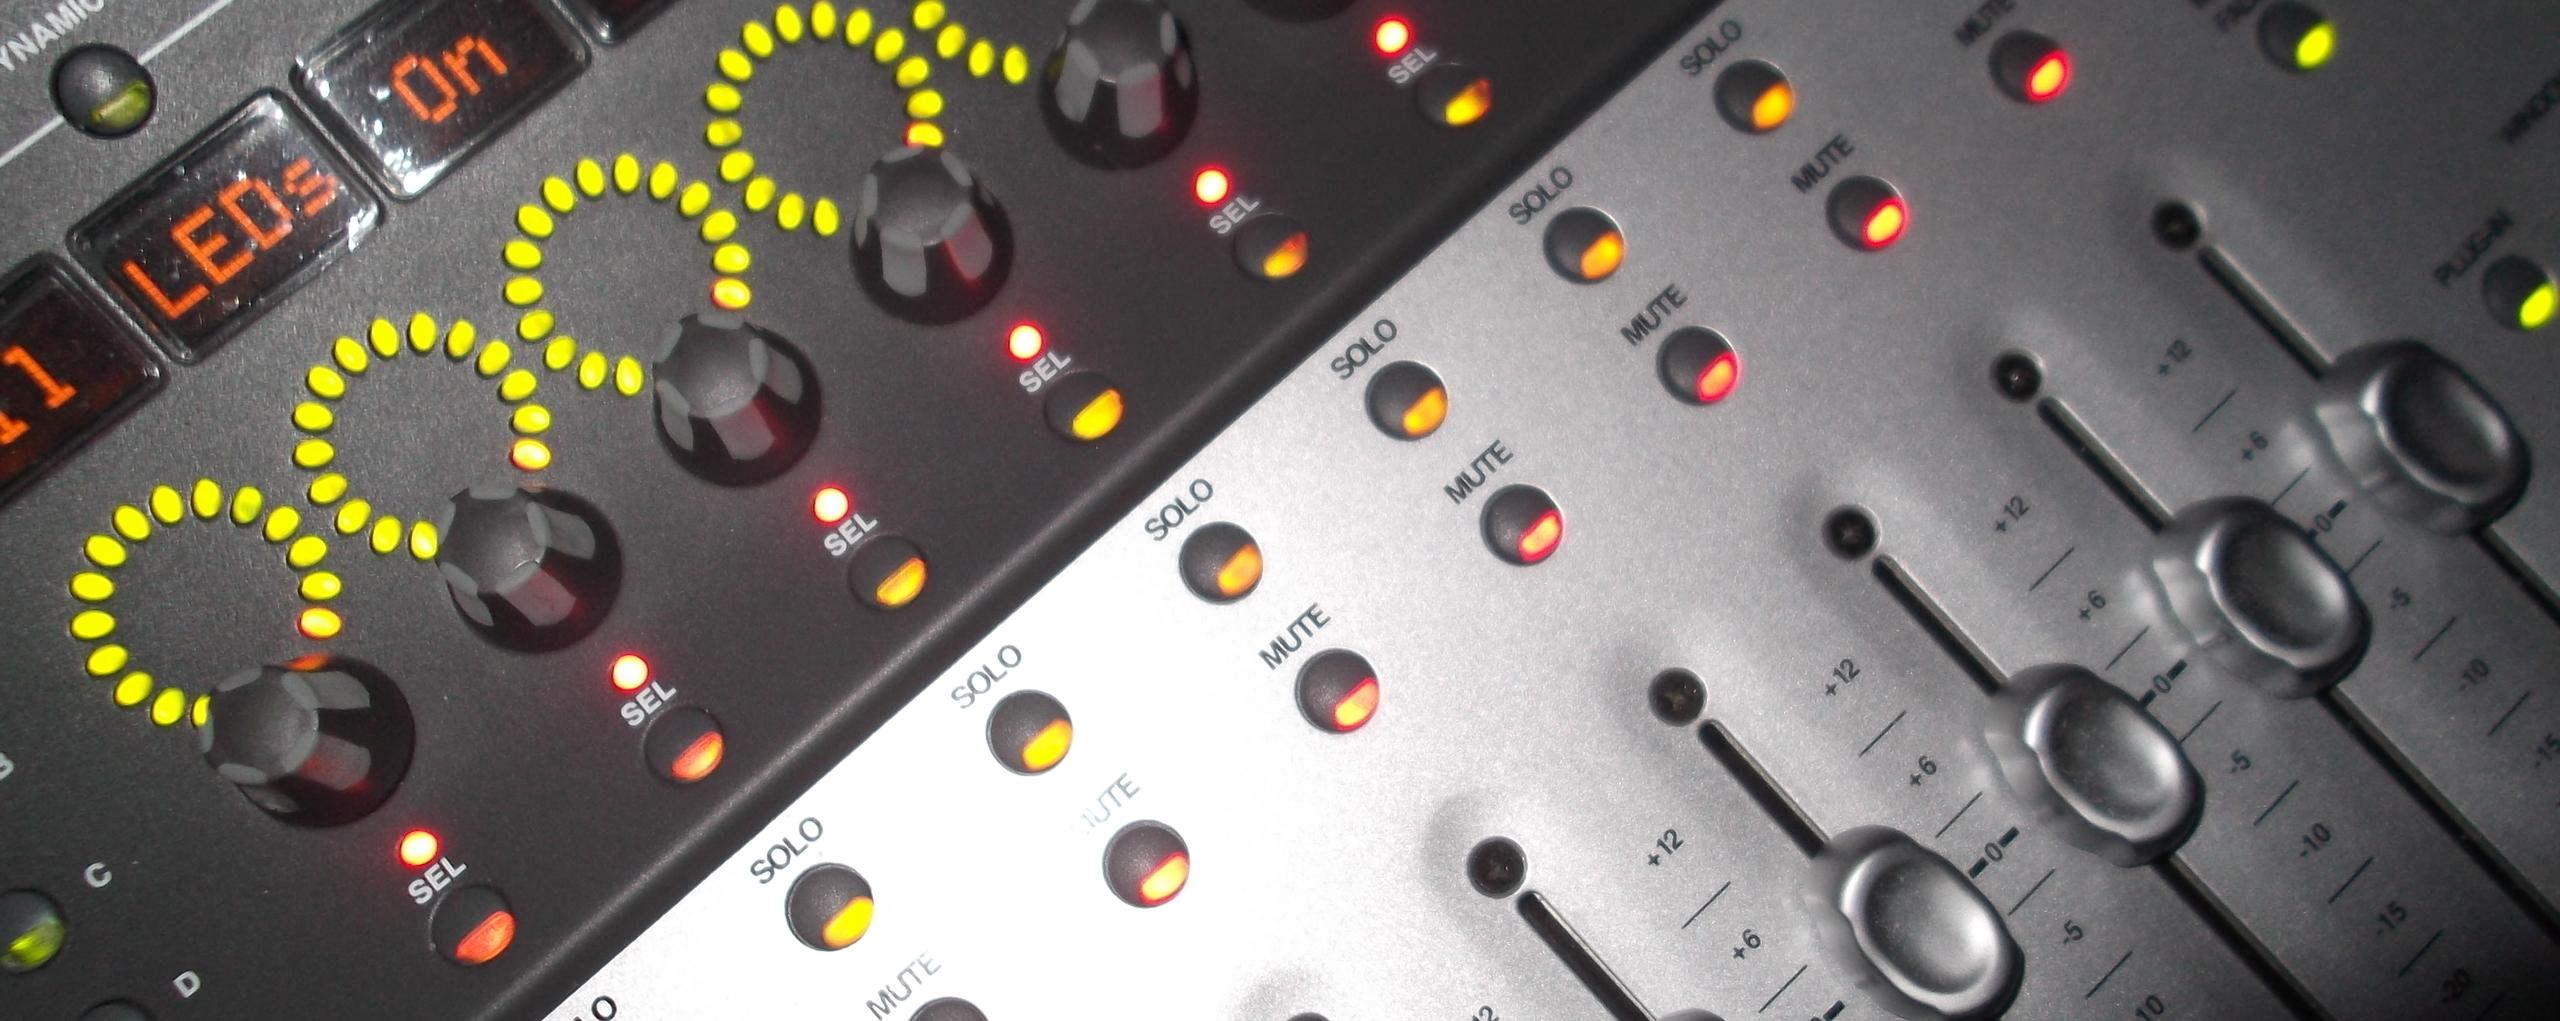 Sound Wave Studios™ (@soundwavstudios) Cover Image